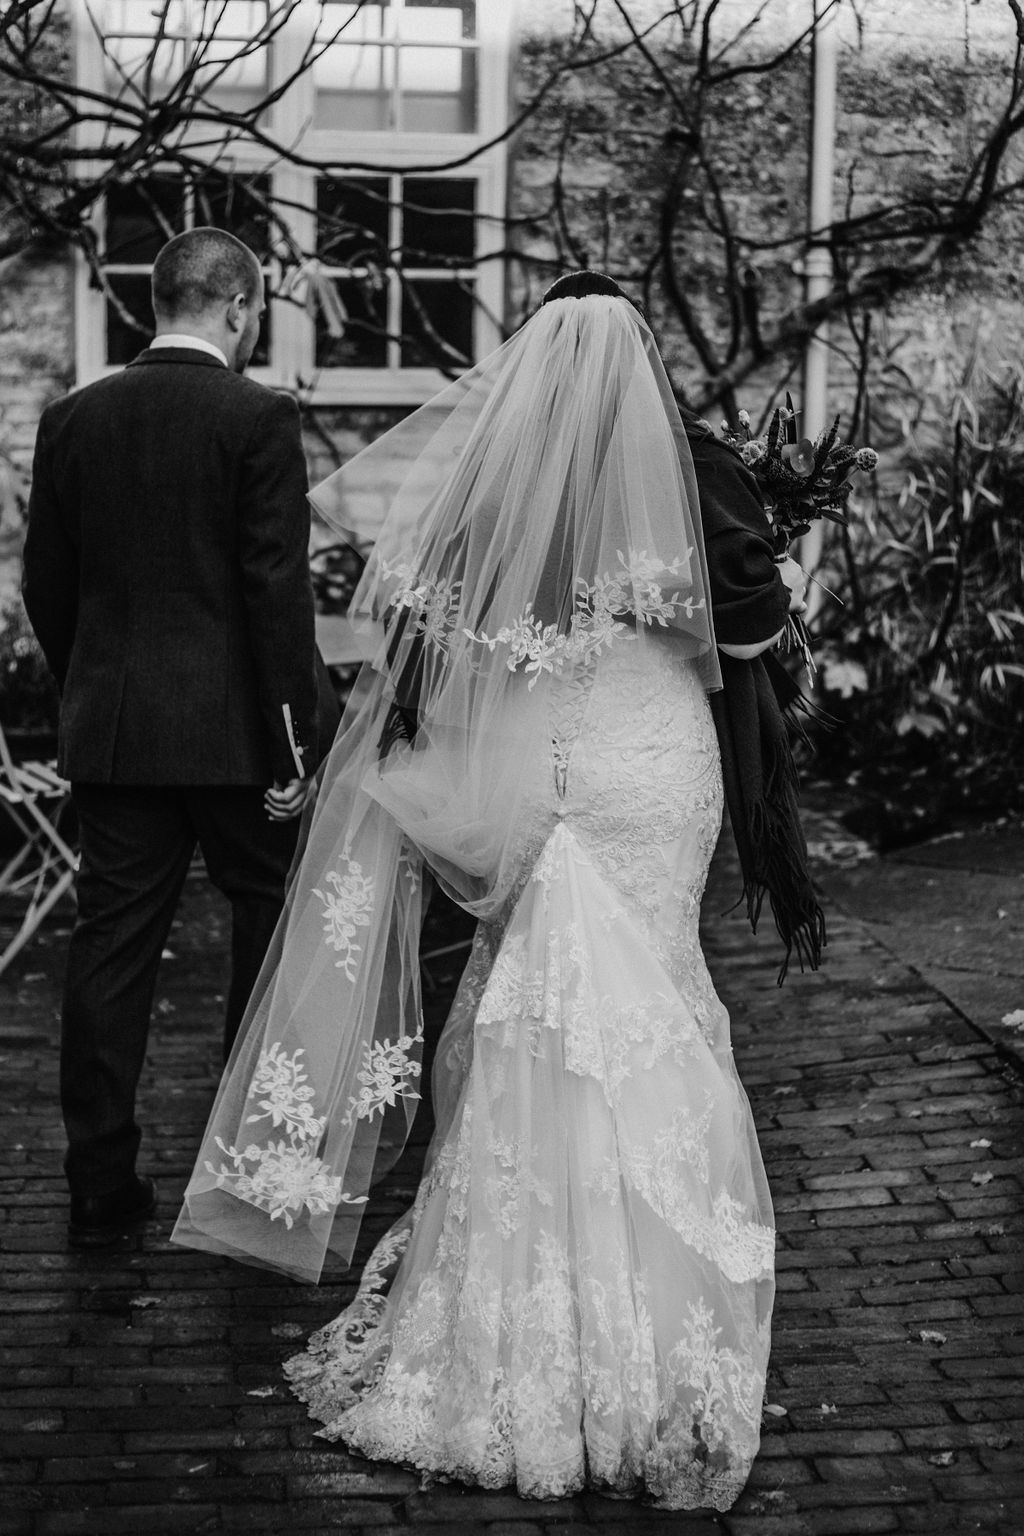 Your_Wedding_Day_236.jpg